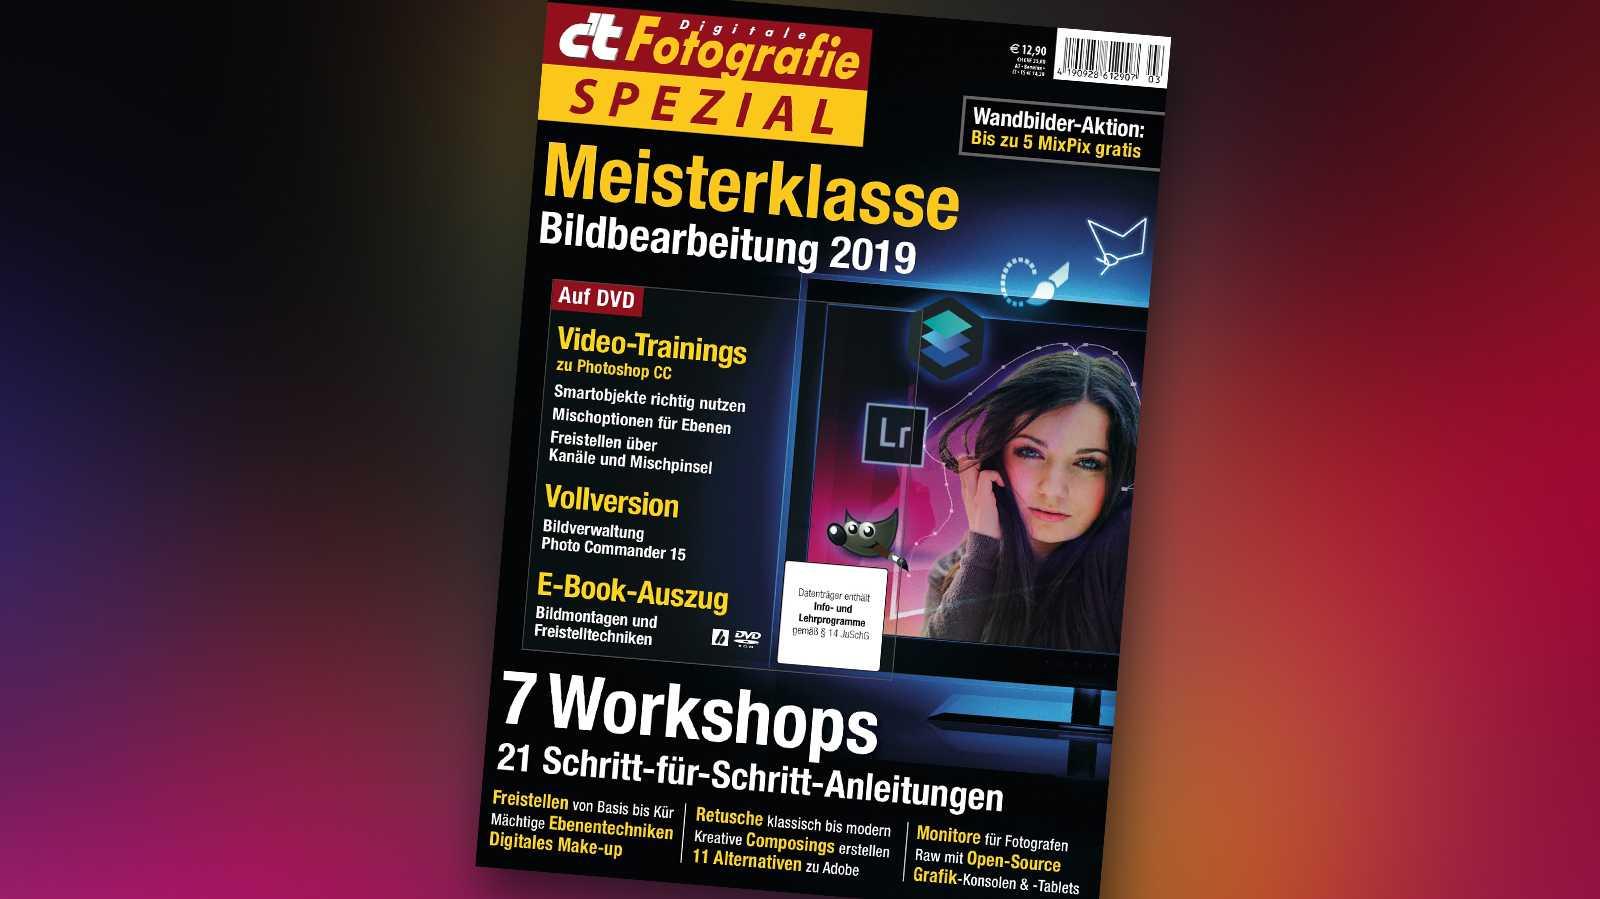 c't Fotografie Meiterklasse Bildbearbeitung 2019